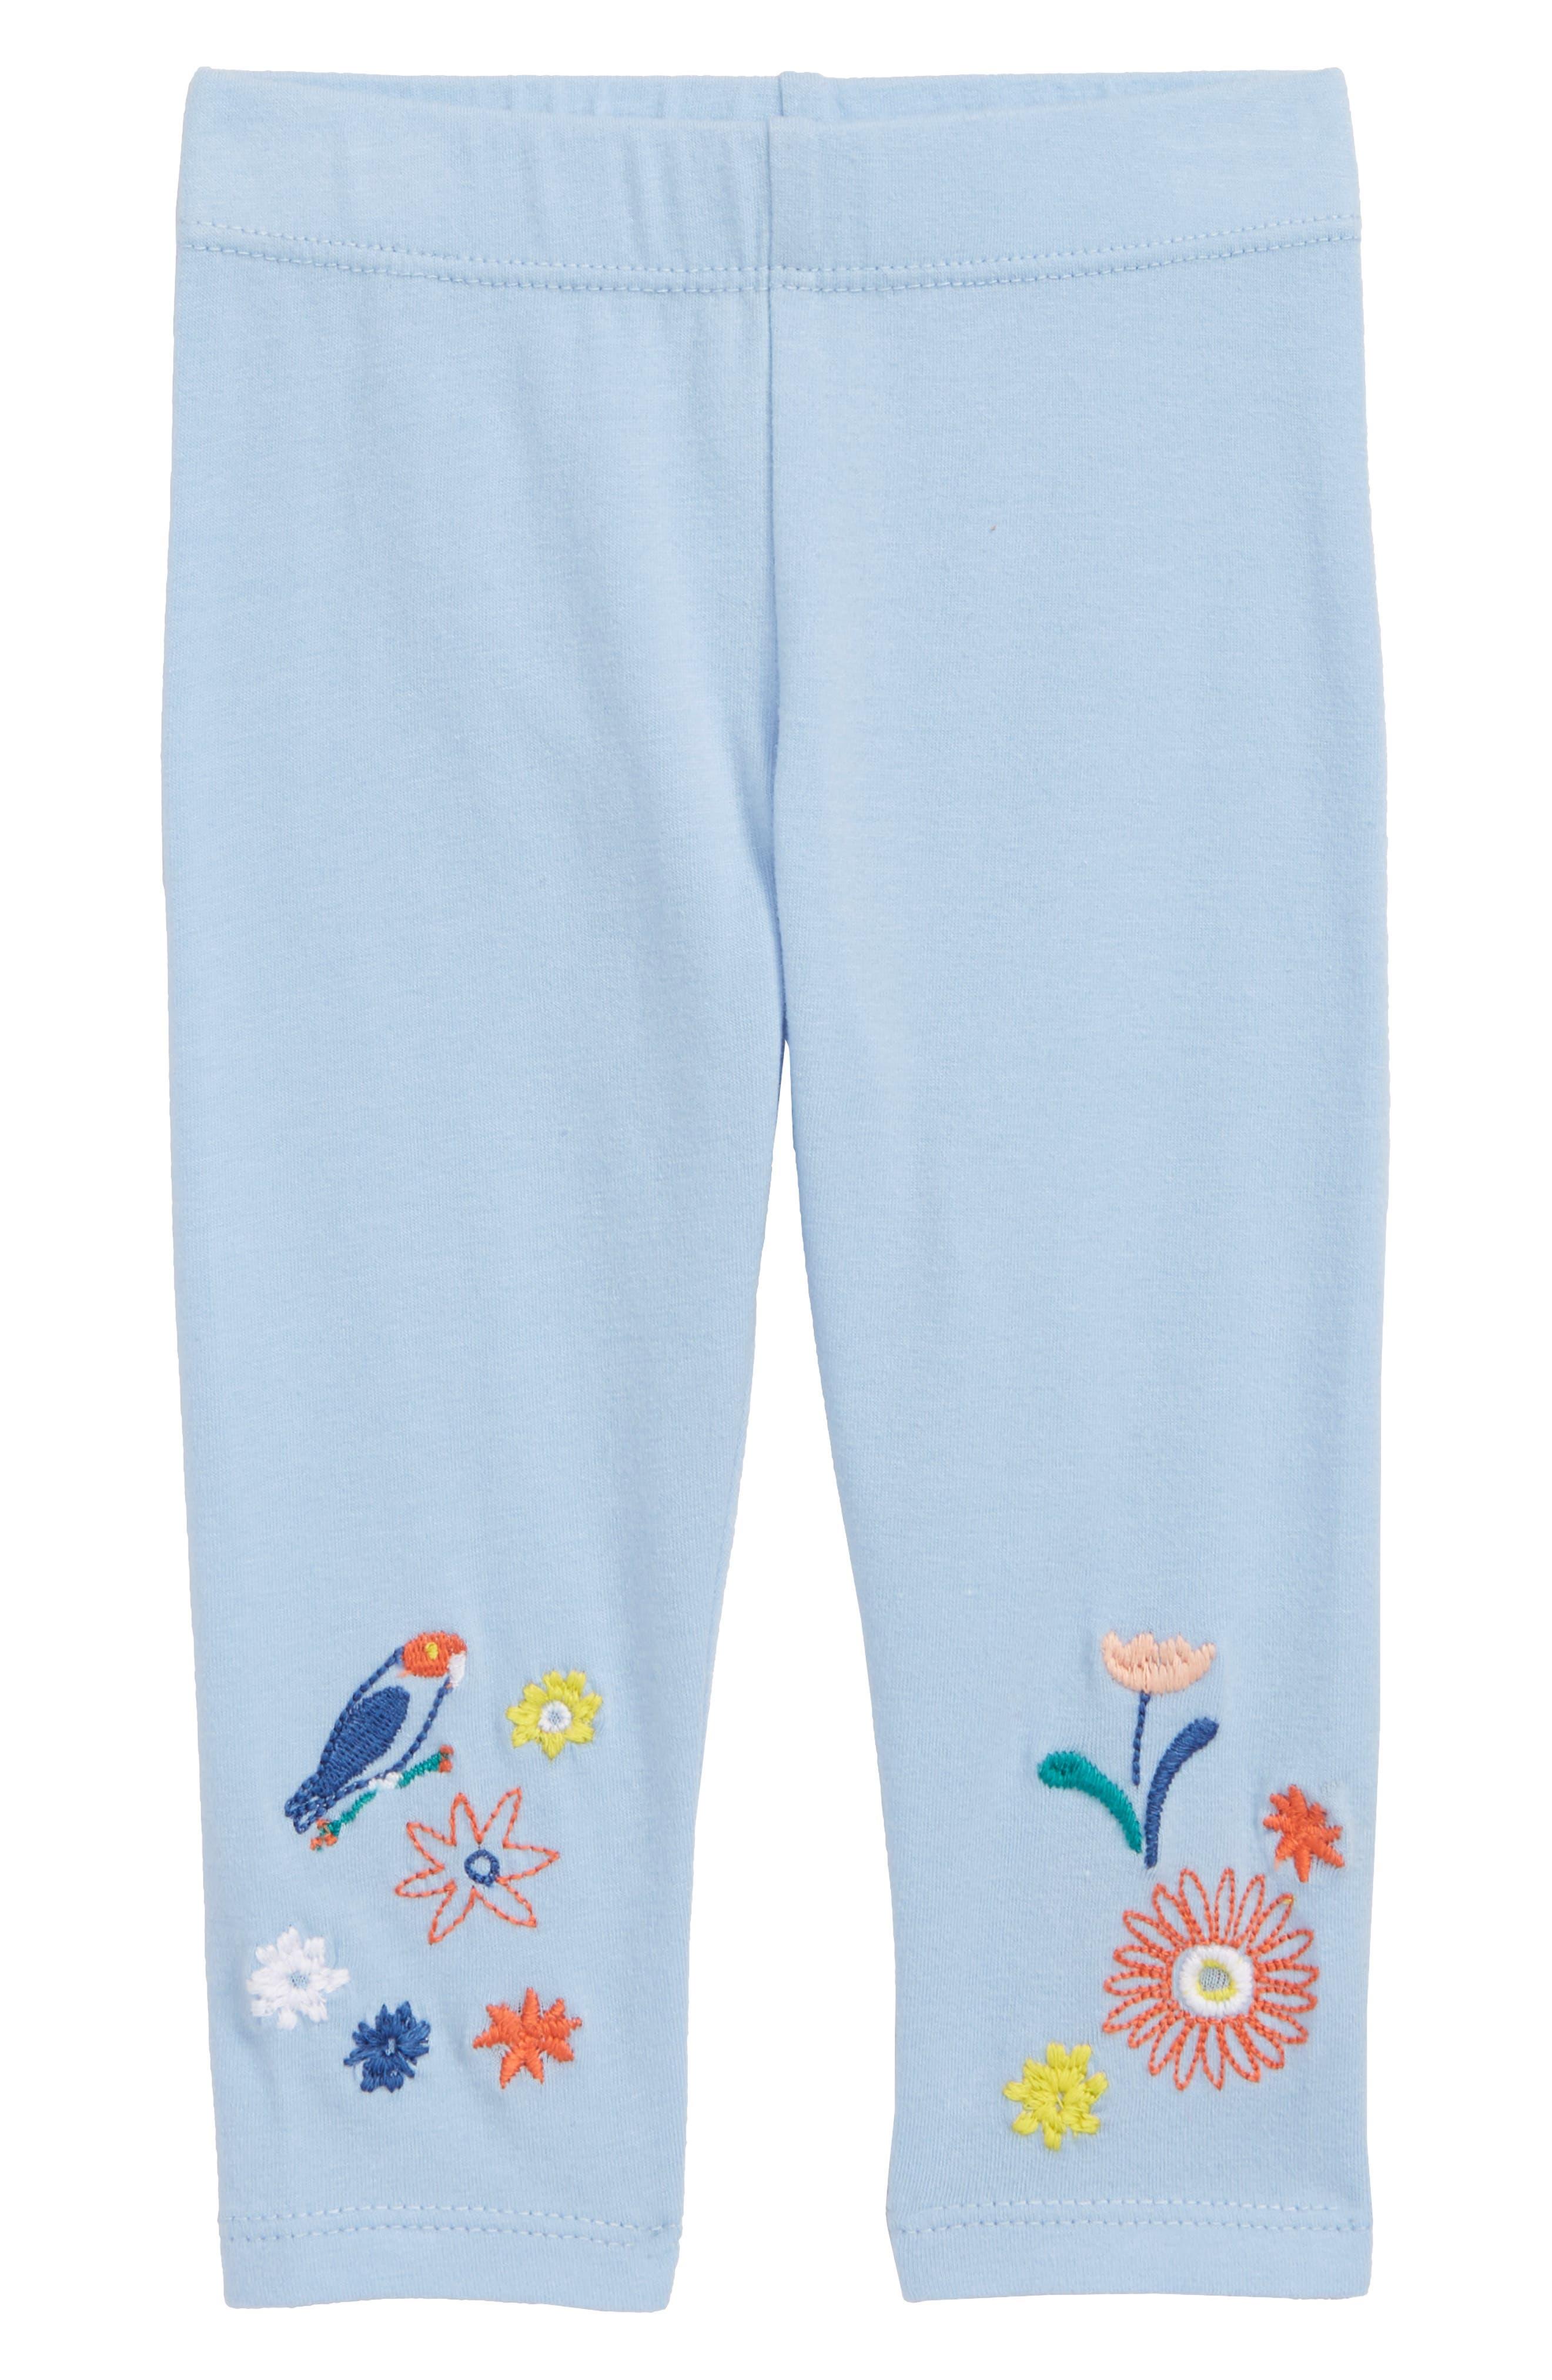 Embroidered Leggings,                             Main thumbnail 1, color,                             Blue Thread